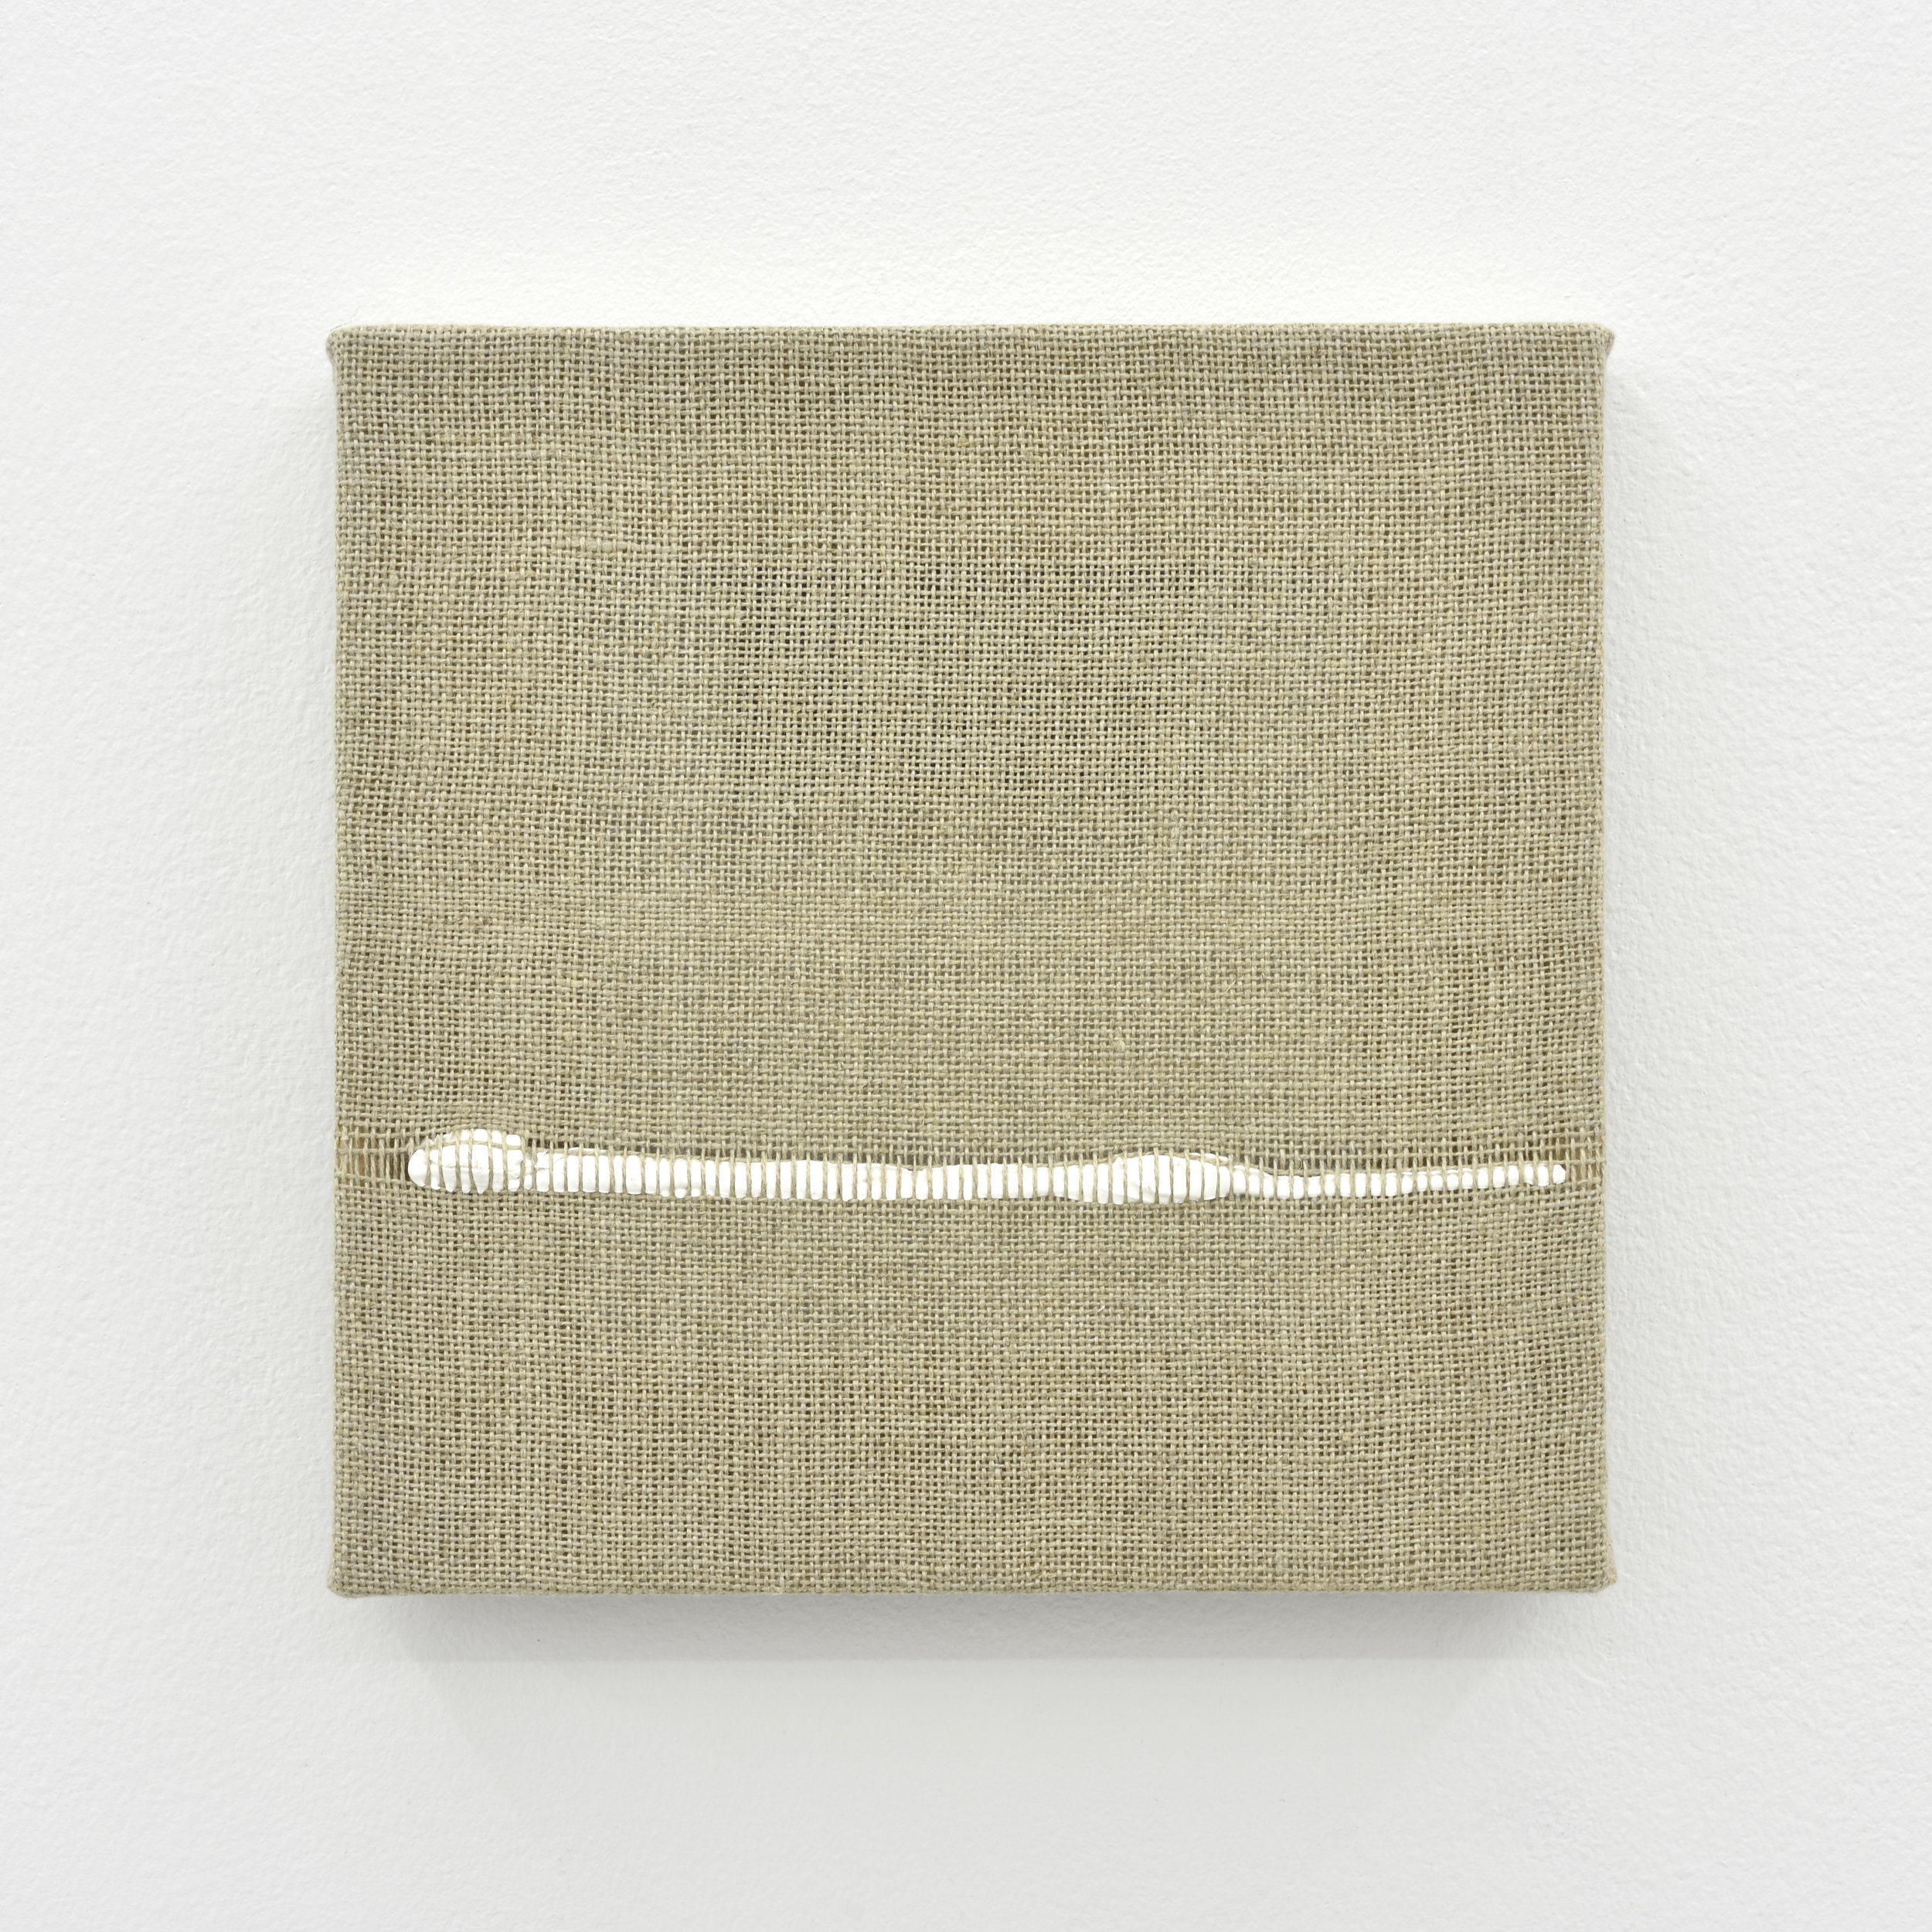 Composition for Woven Horizon Line (White), 2017 acrylic paint woven through linen 20 x 20 x 2 cm - 7 7/8 x 7 7/8 x 0 3/4 inches